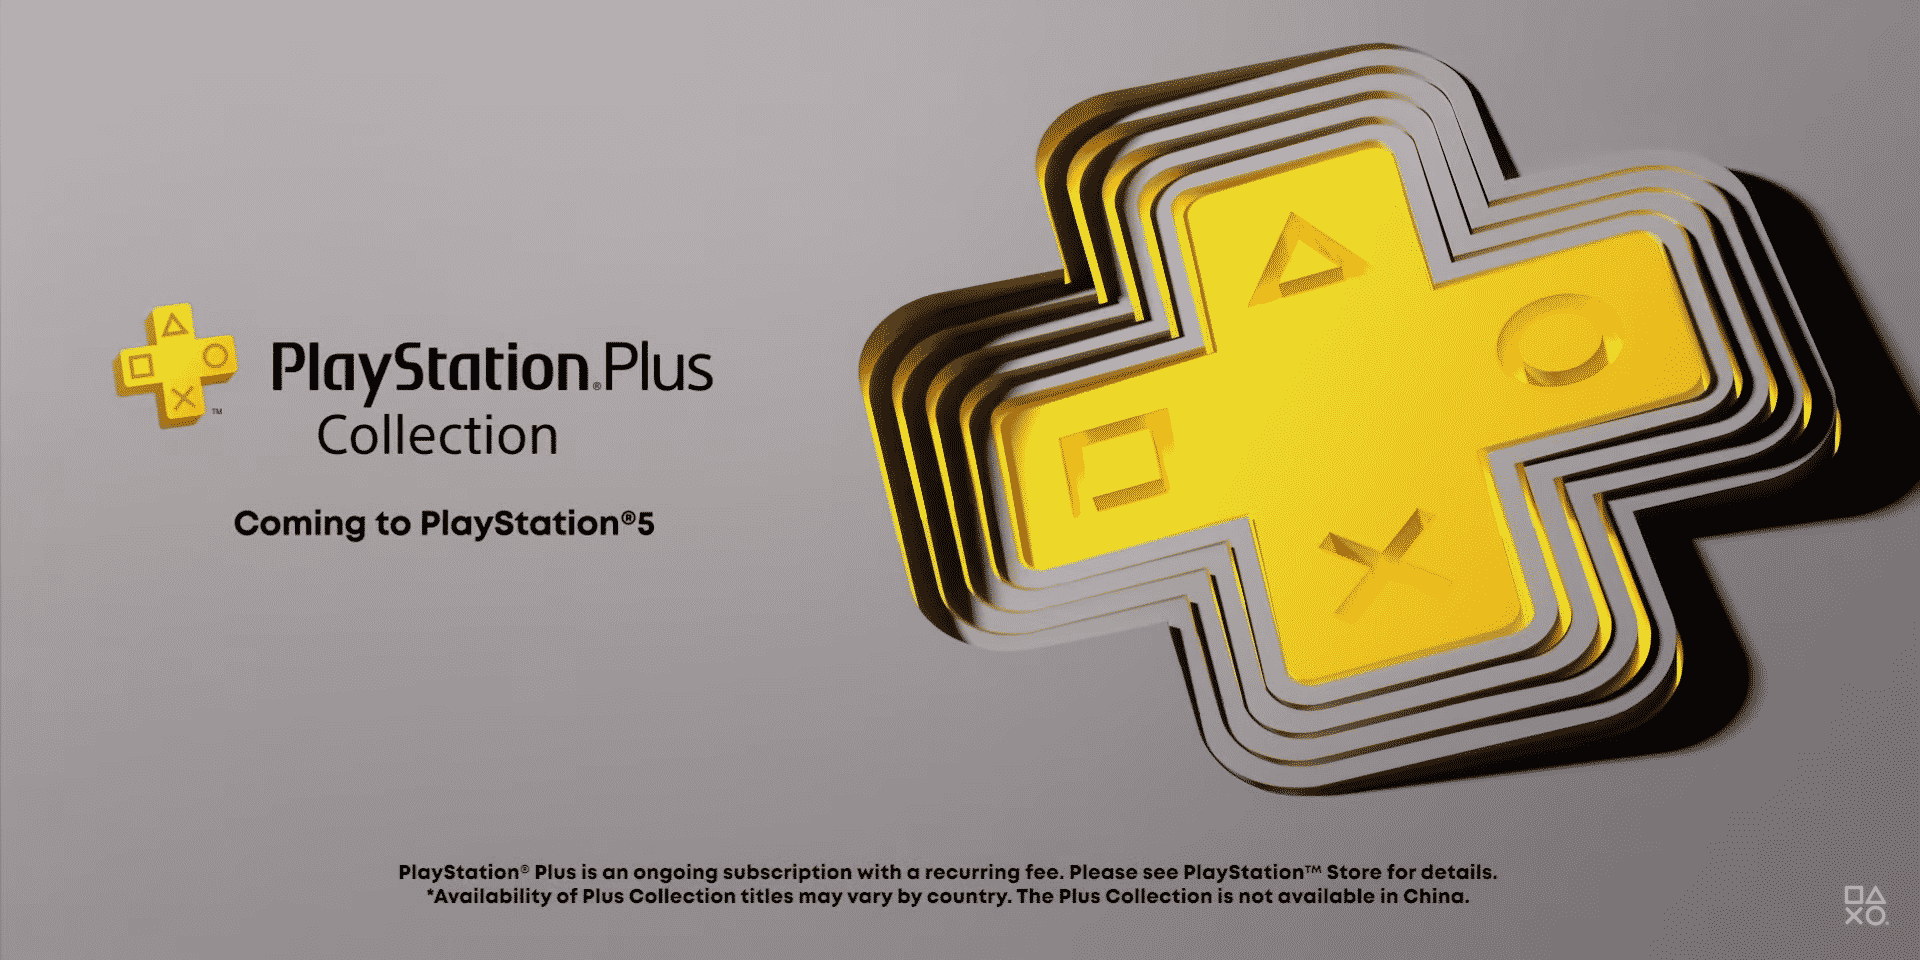 Playstation Plus Collection giochi Ps4 giocabili su Ps5